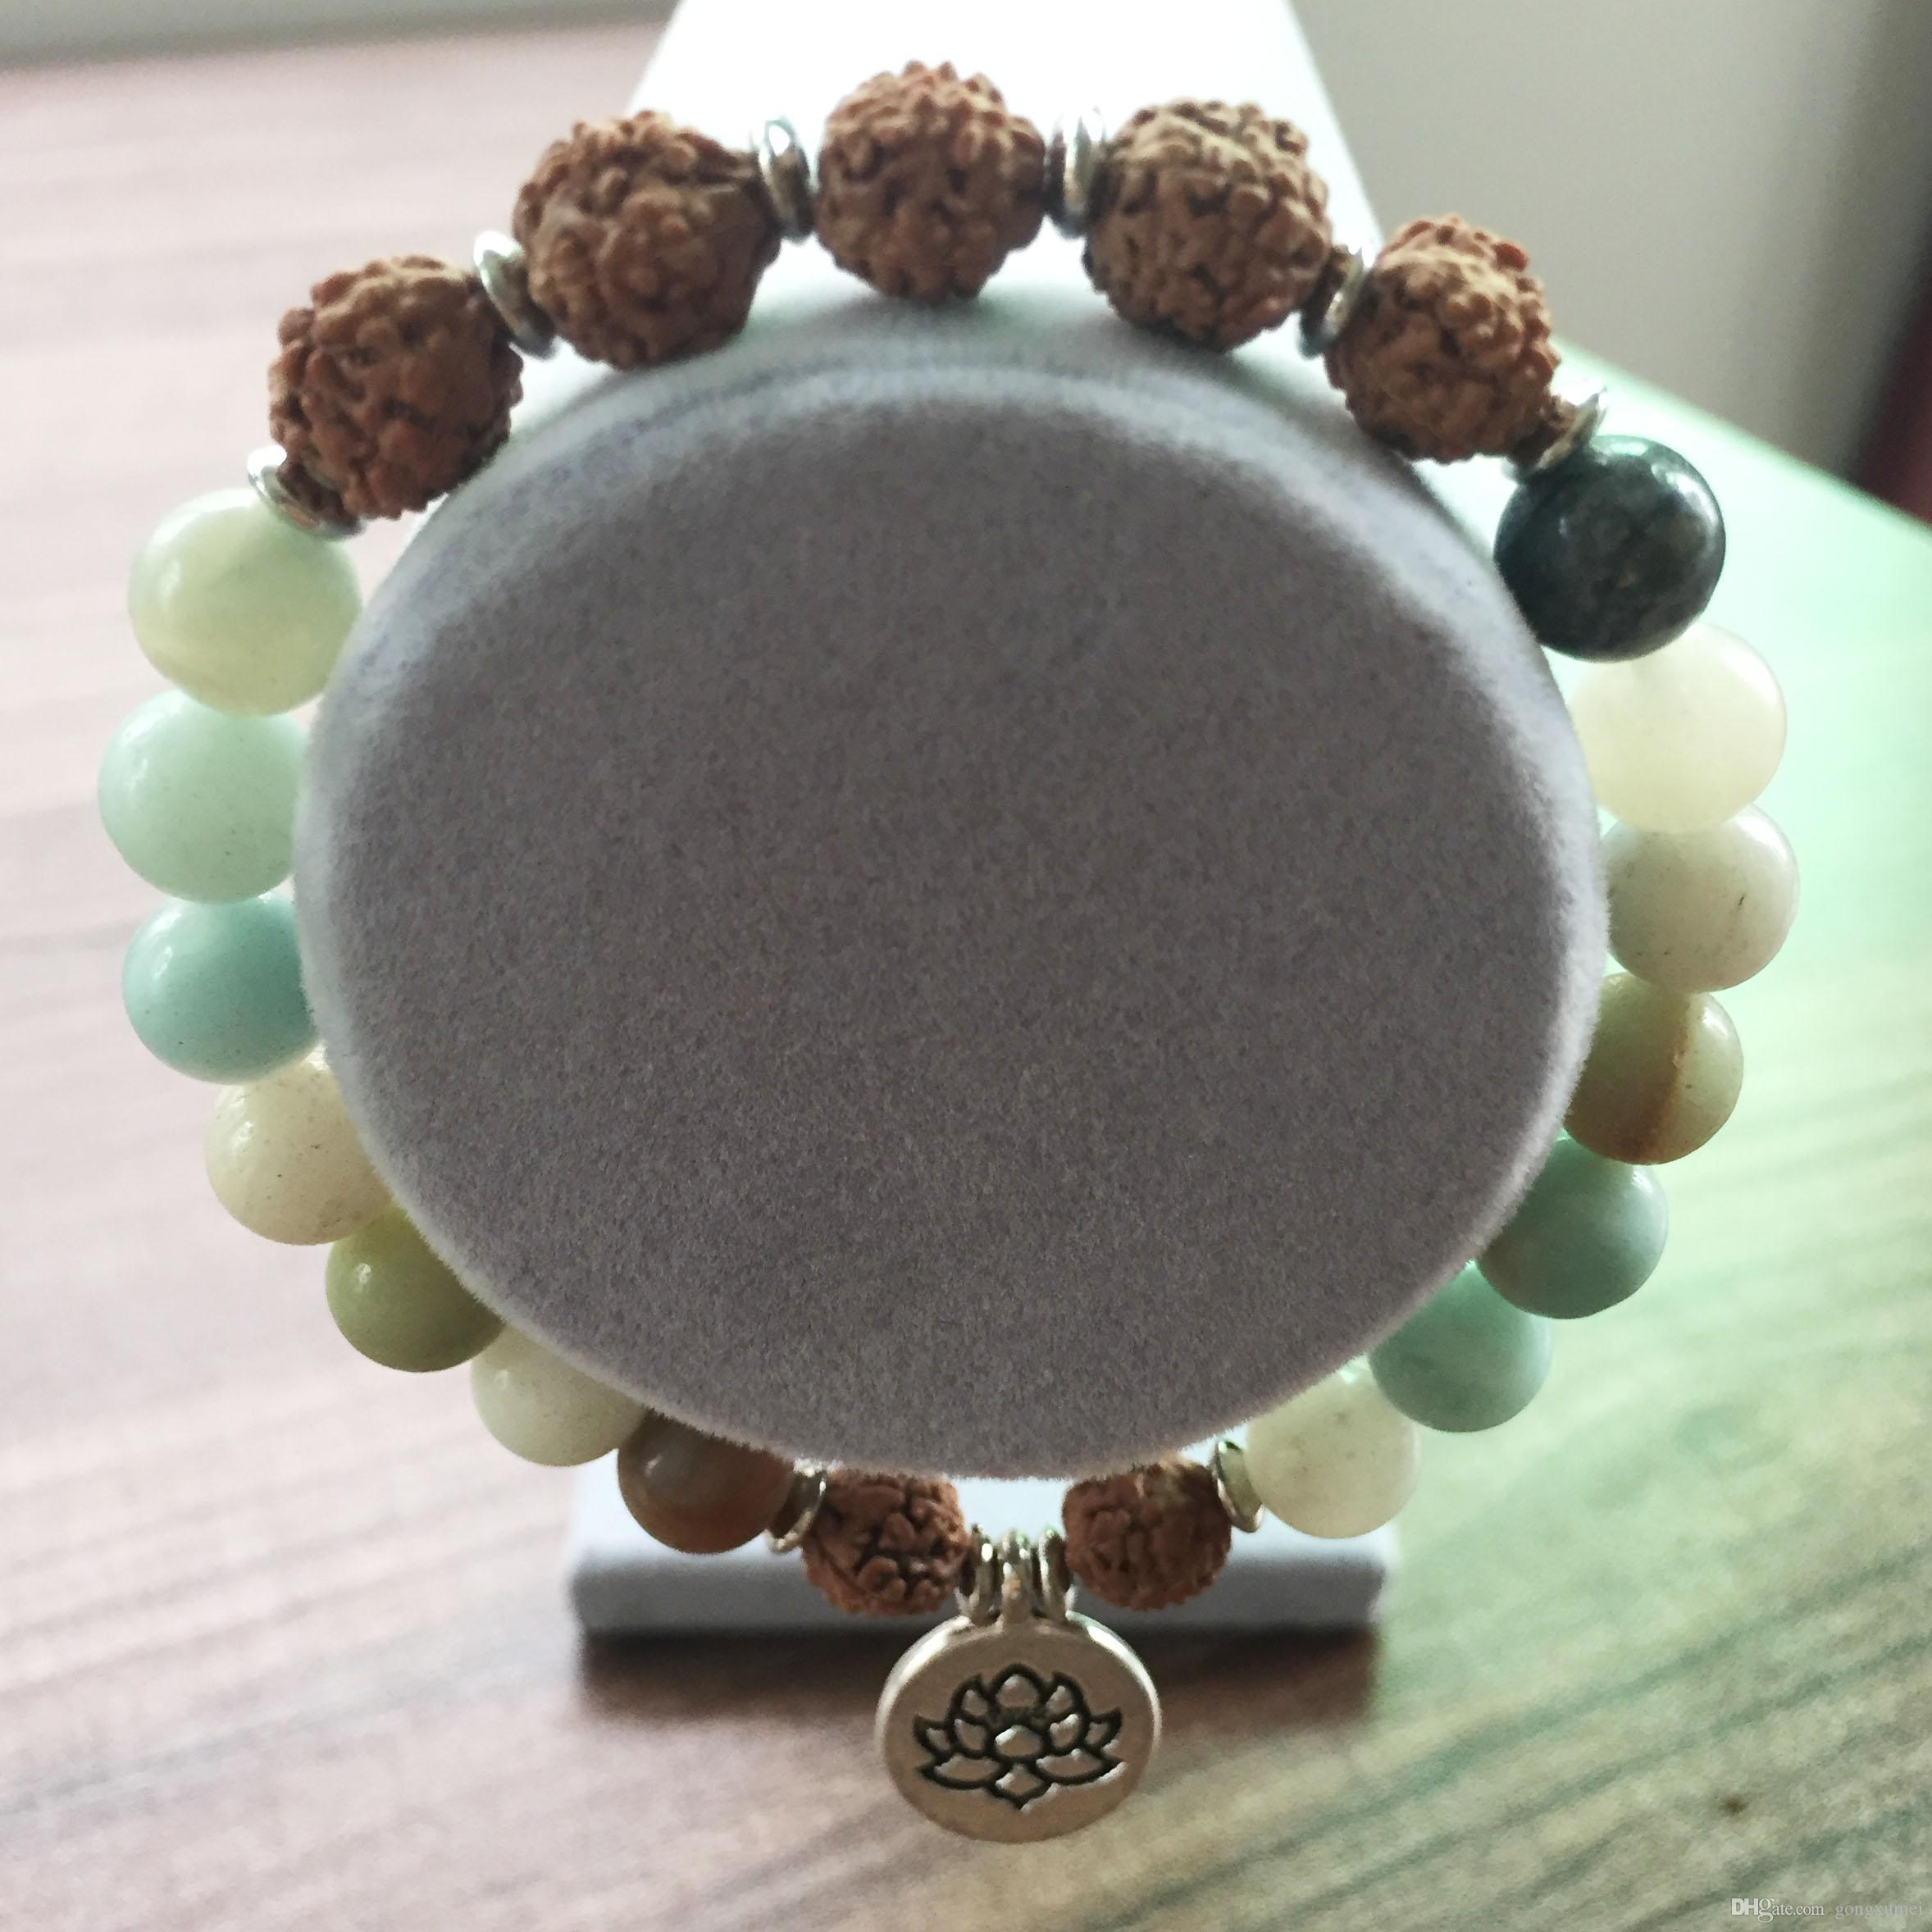 Naturstein 8MM Amazonite Armband Perlen Armbänder Armband Frauen Lotus Anhänger Yoga Gebet Mala Perlen Bodhi Armbänder